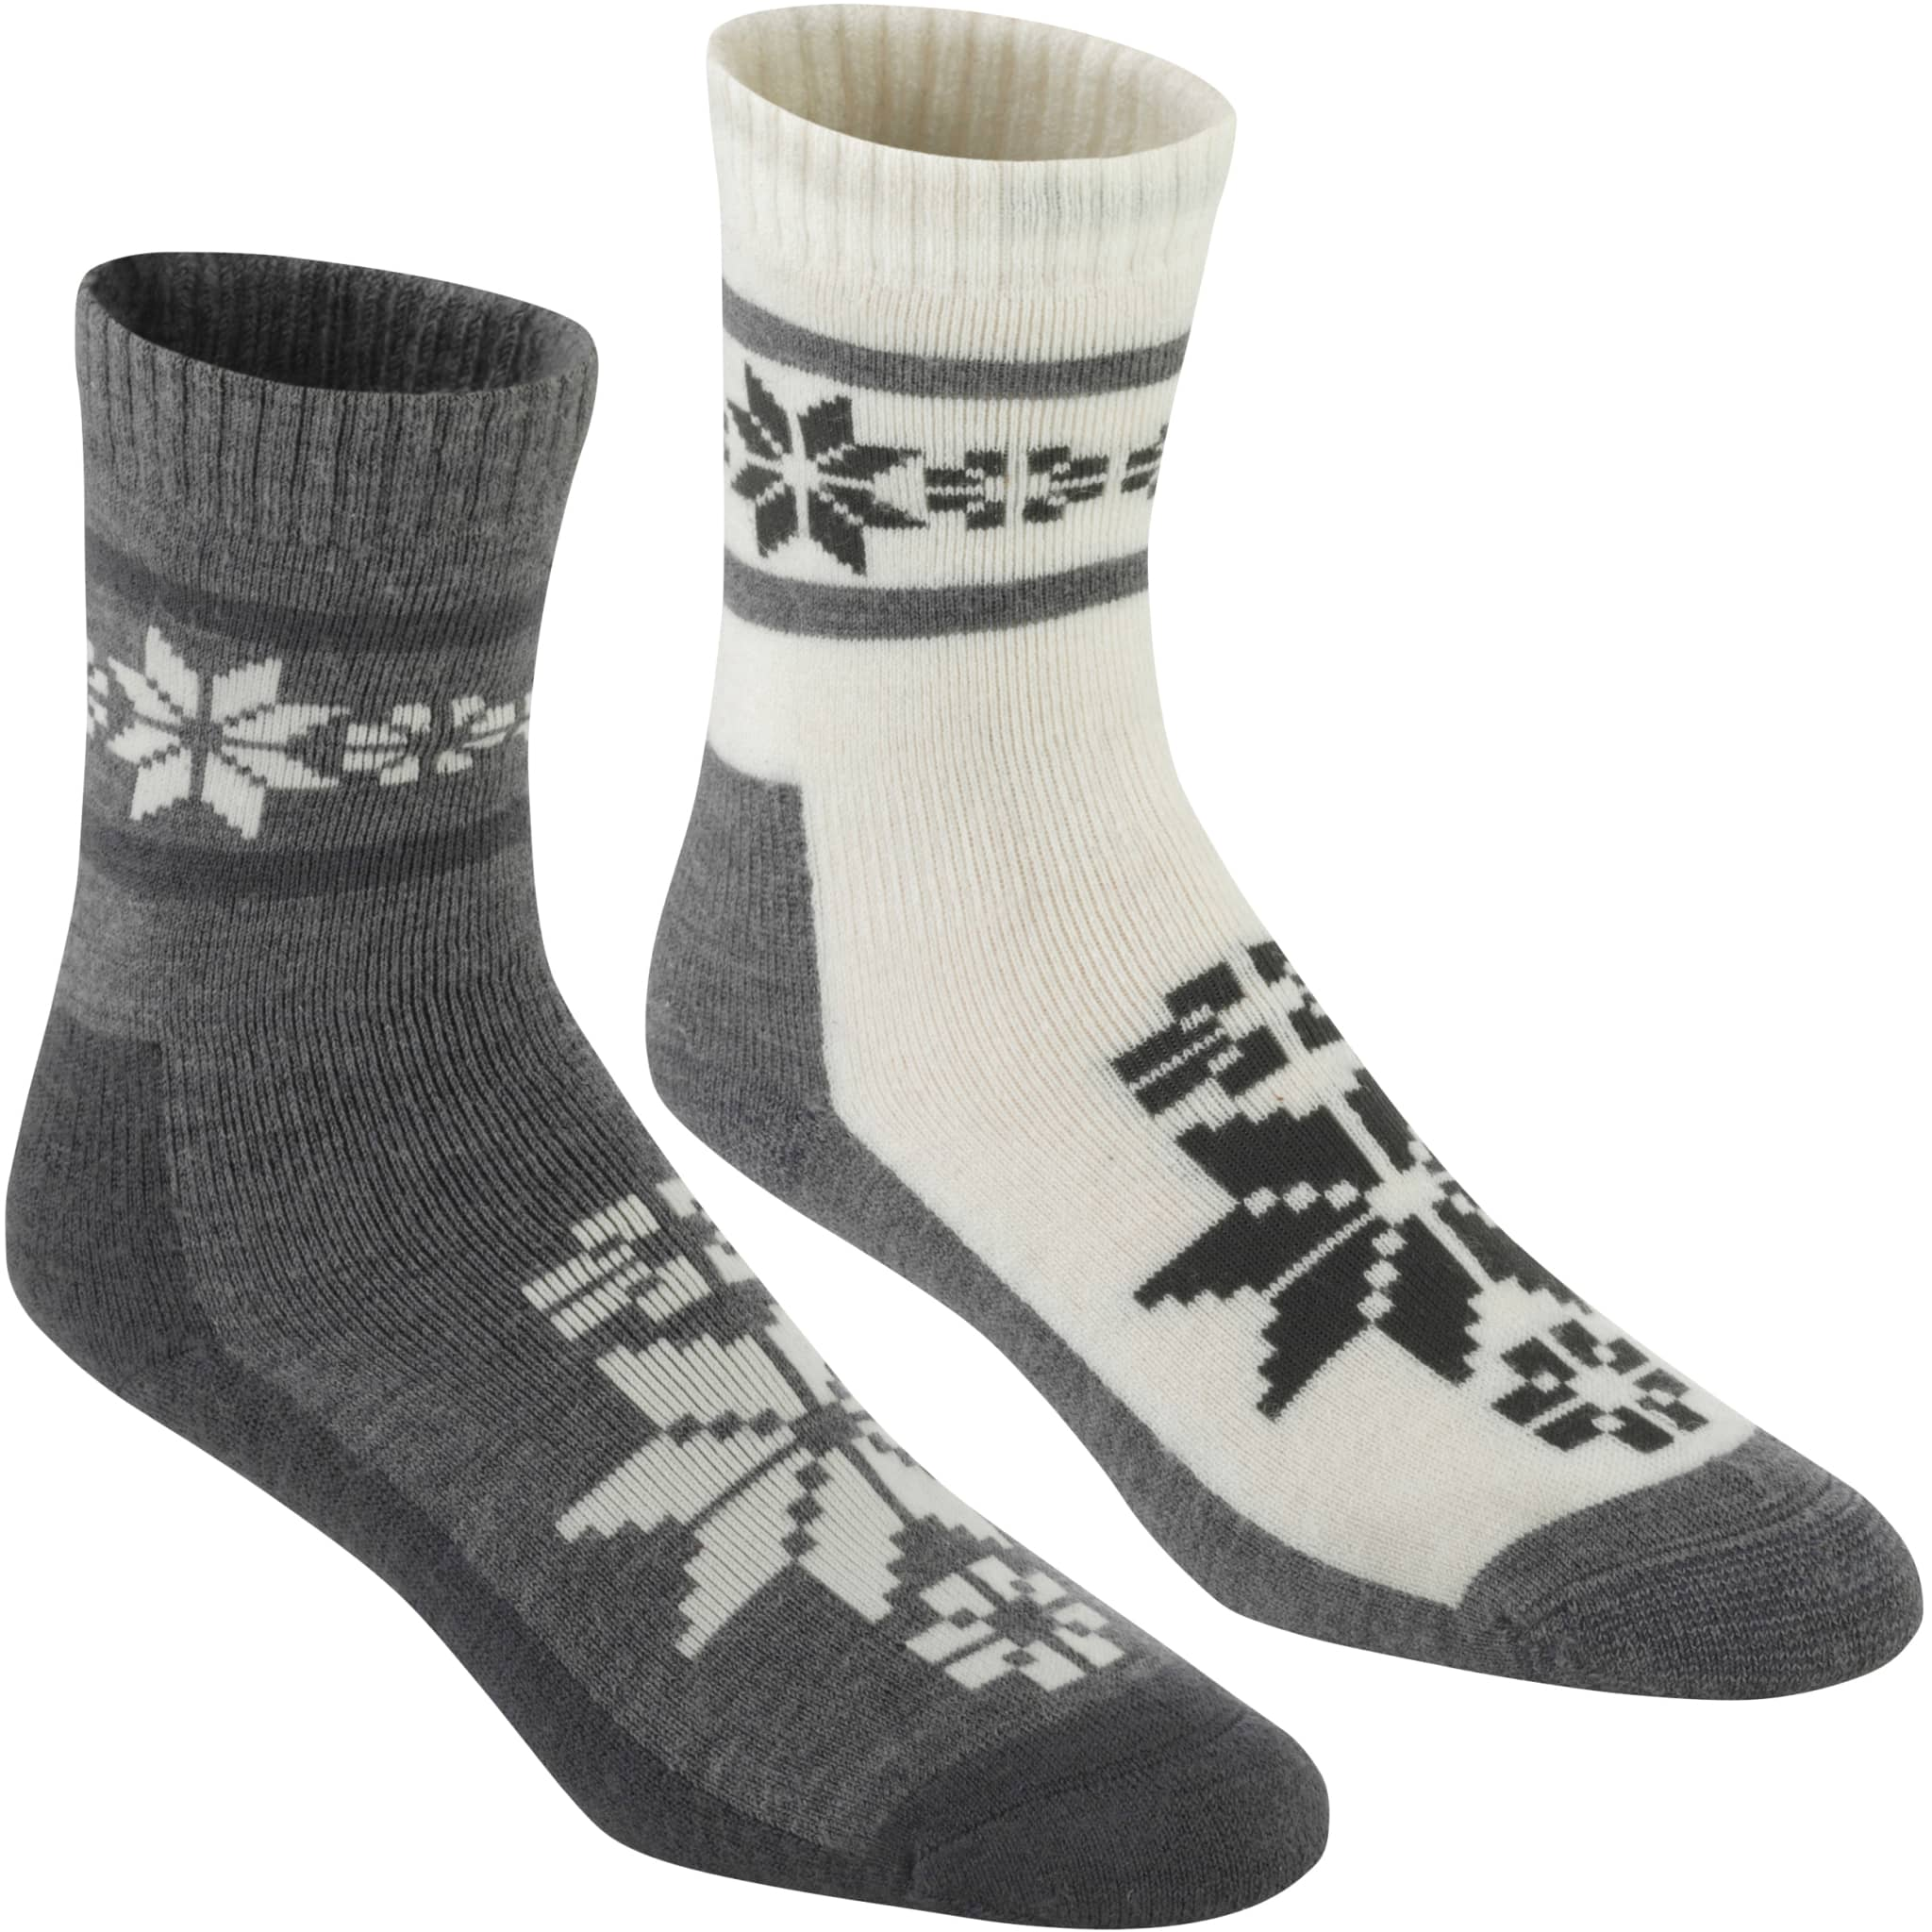 Rusa Wool Sock 2PK